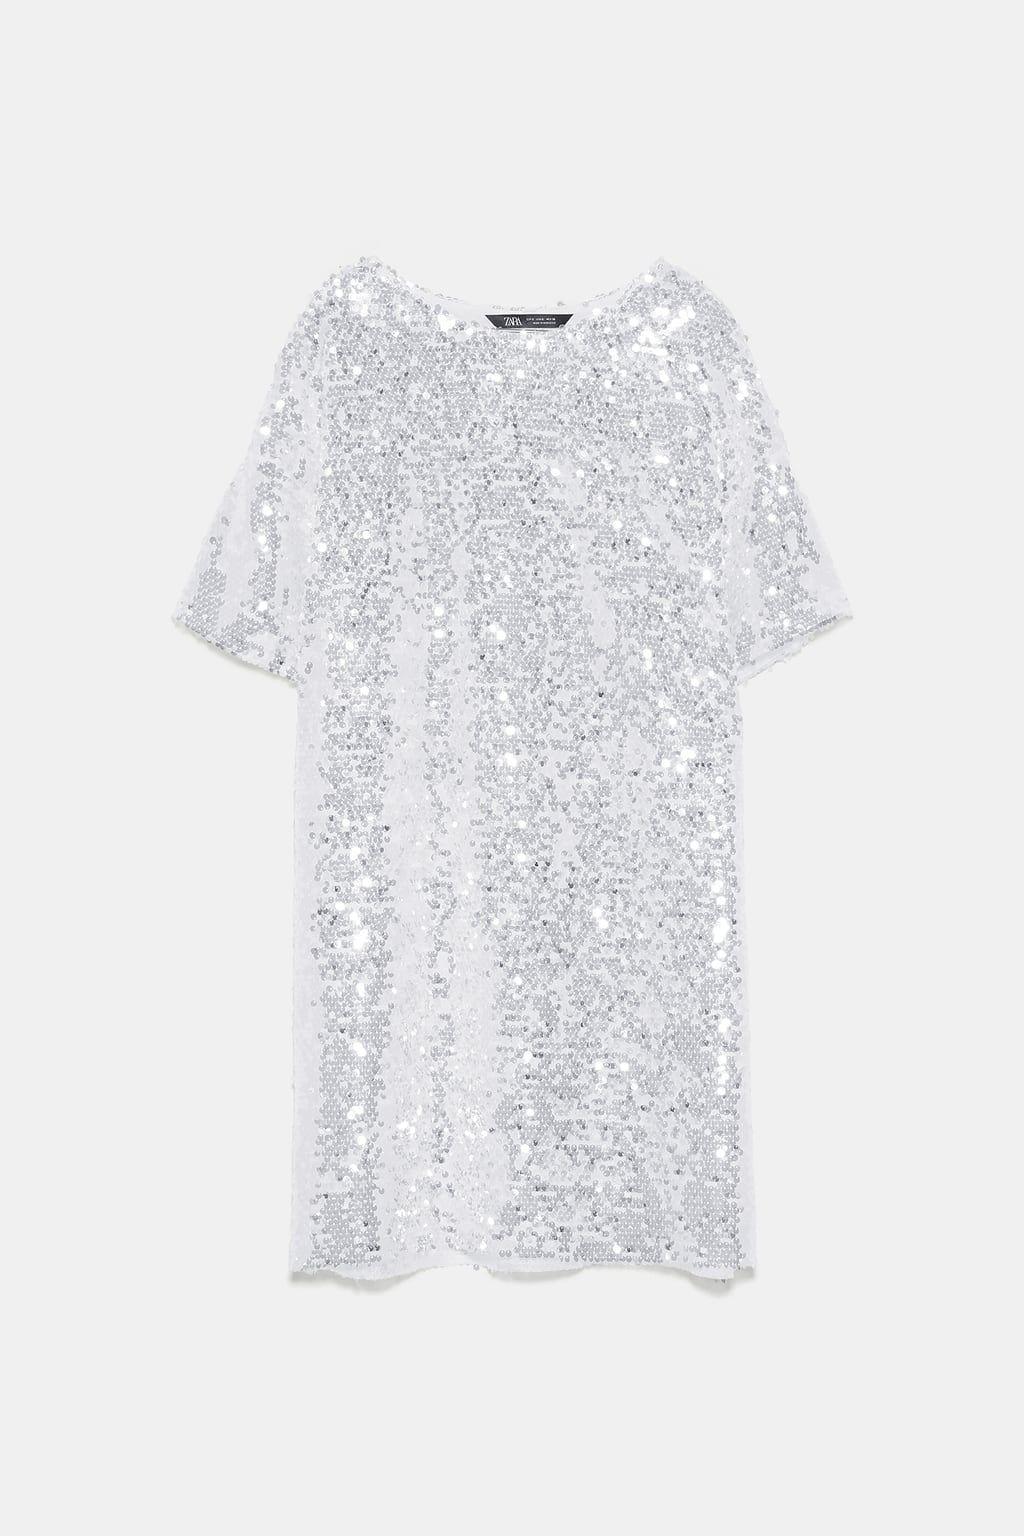 SEQUINNED DRESS - NEW IN-WOMAN  ZARA United Kingdom